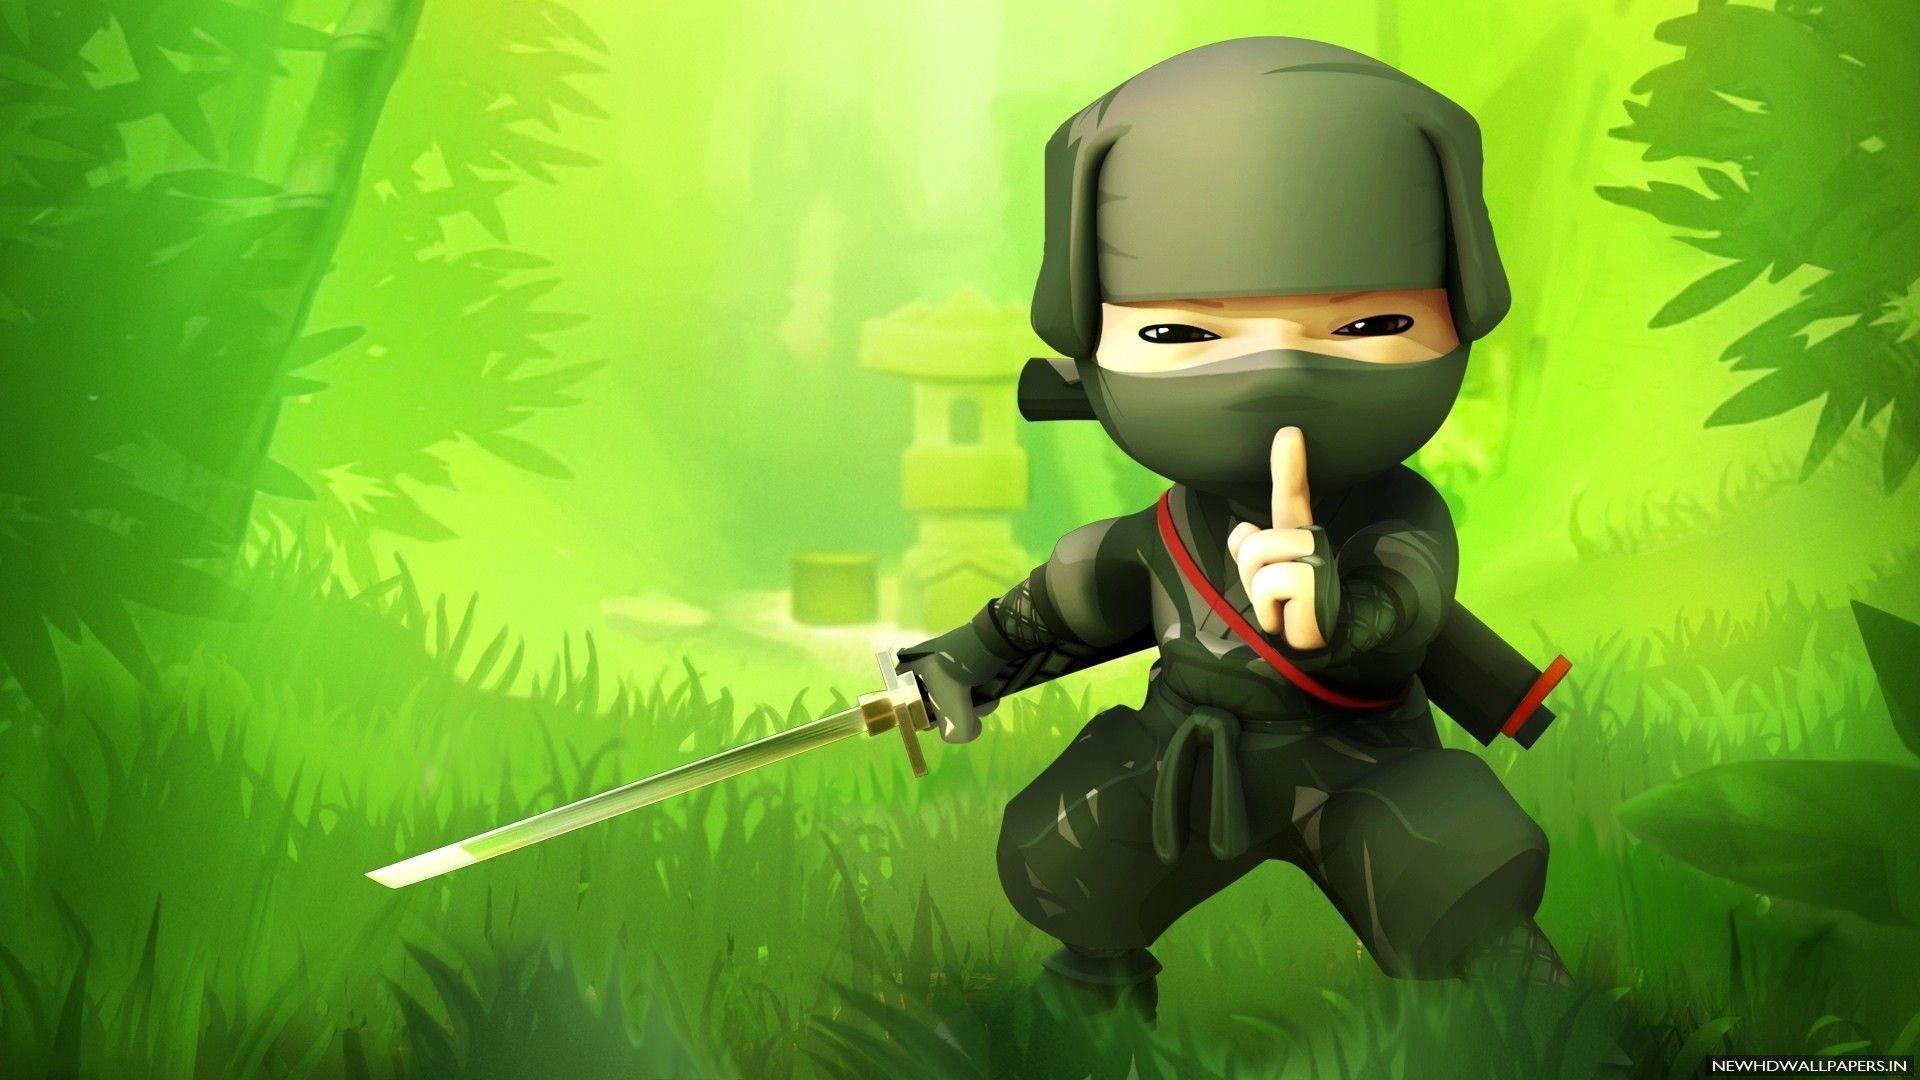 Res: 1920x1080, Anime Ninja Wallpaper HD Photos Collections